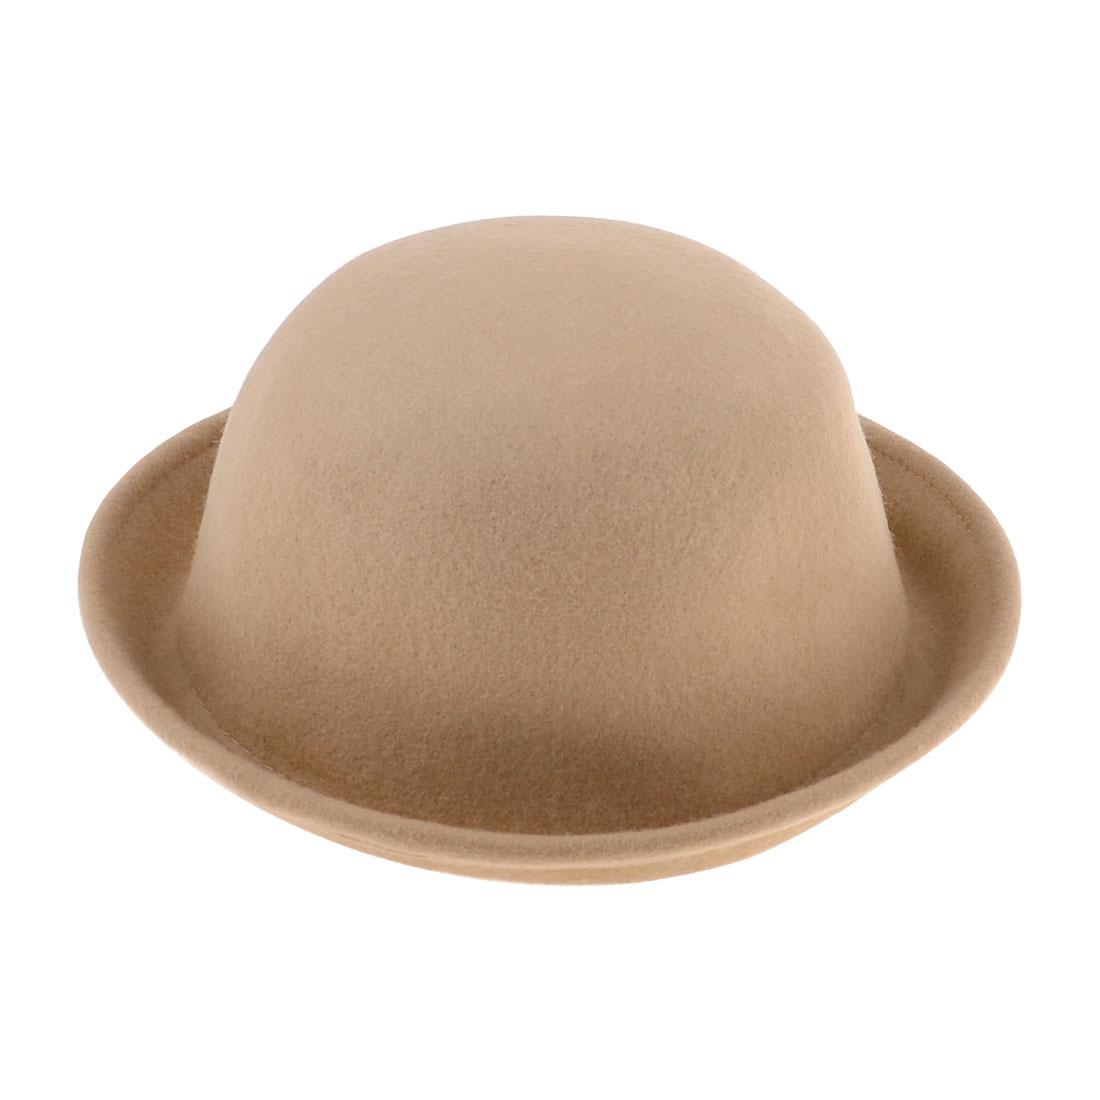 Ladies Autumn Winter Korea Style Solid Beige Fedora Hat Cap Size M